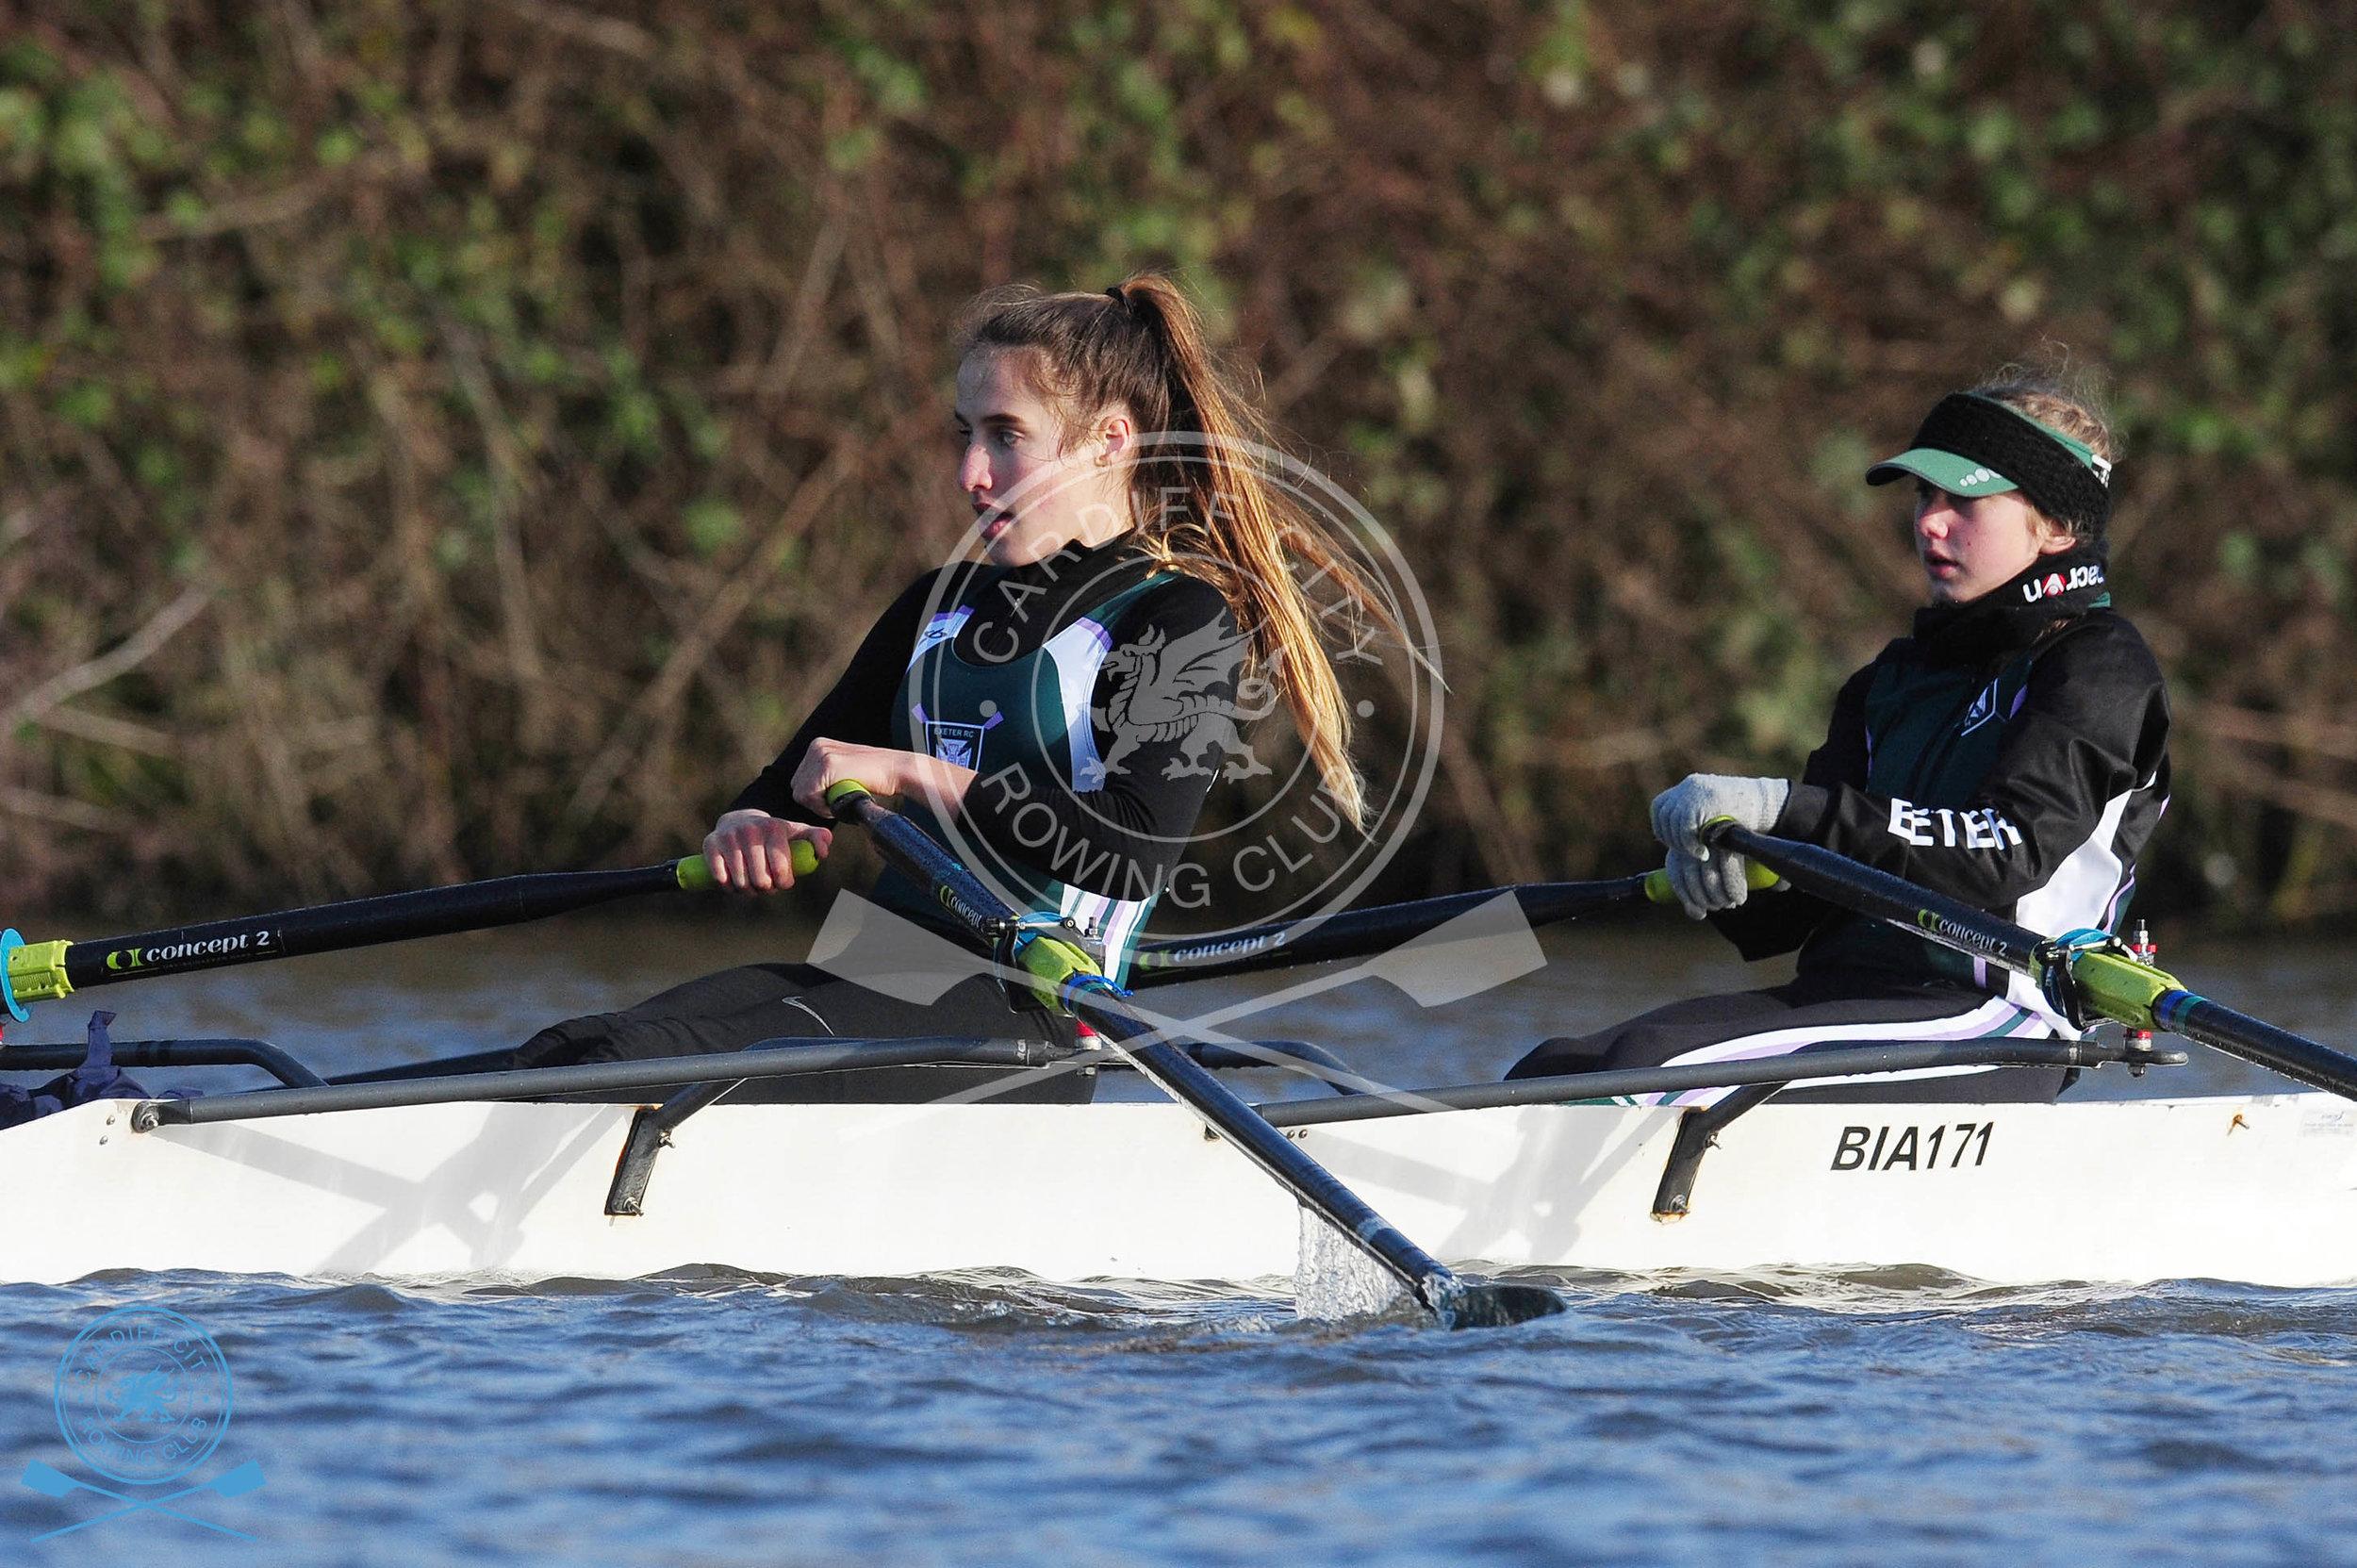 DW_280119_Cardiff_City_Rowing_330.jpg